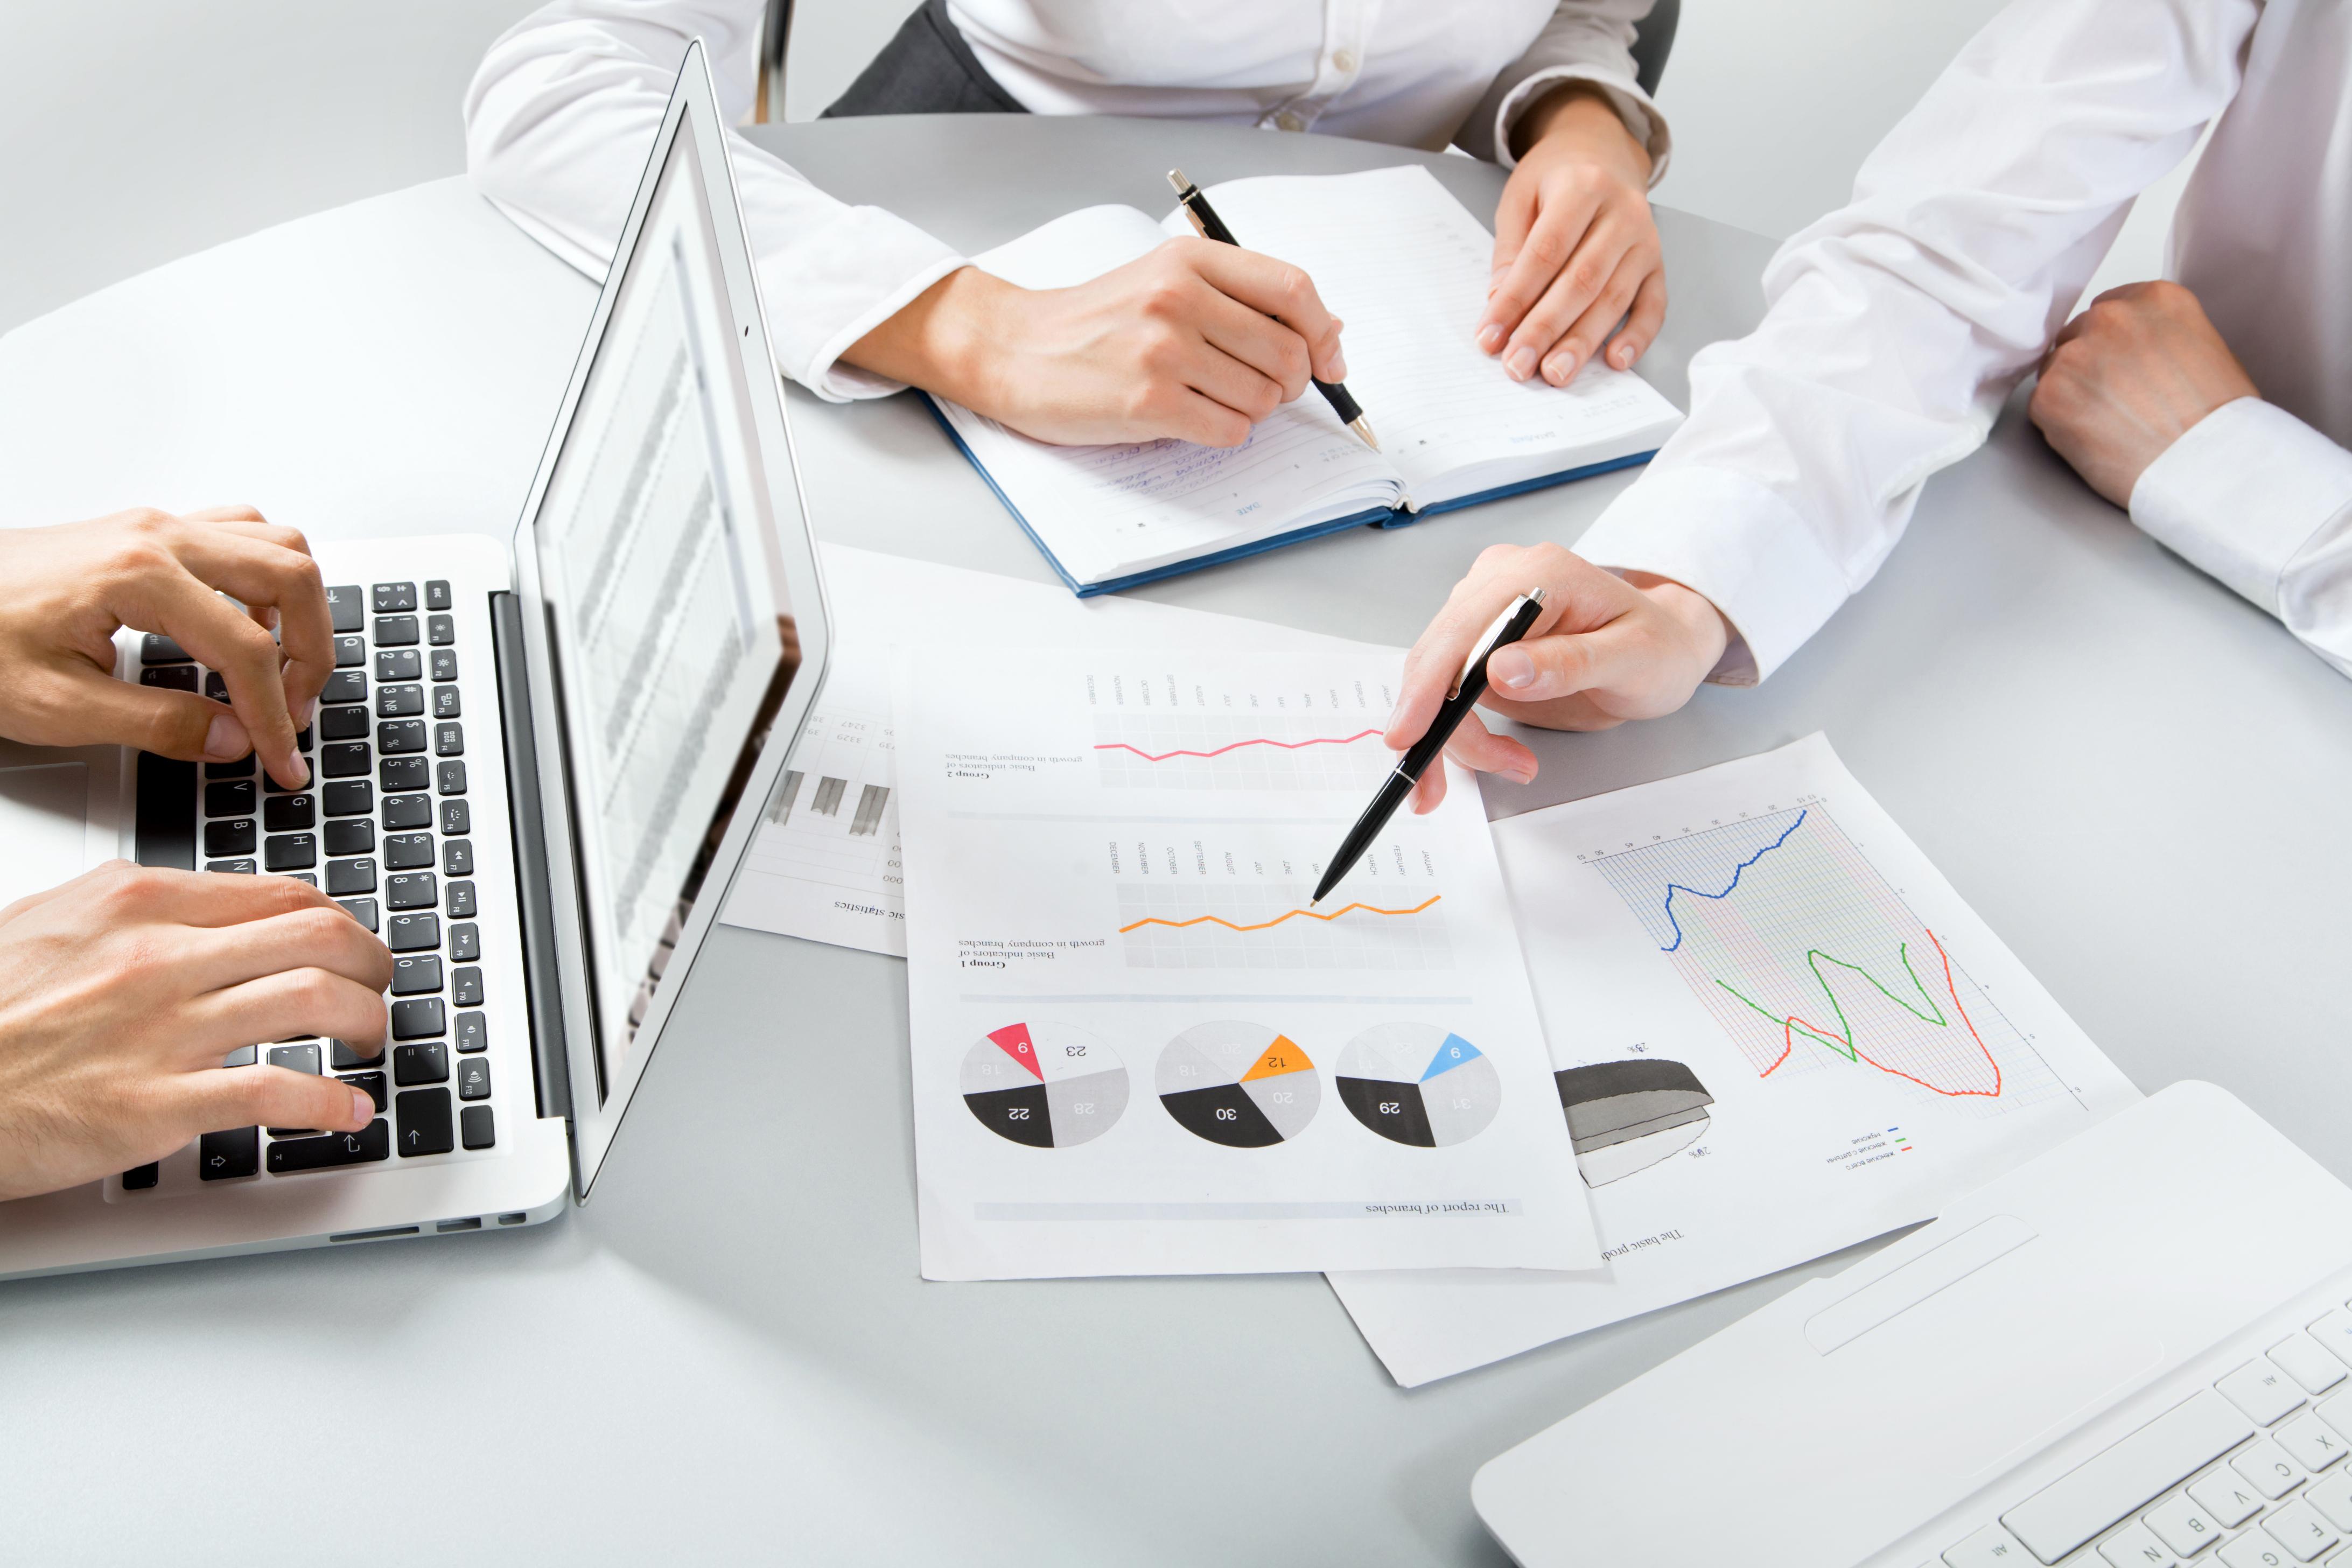 Картинки бизнеса для презентации